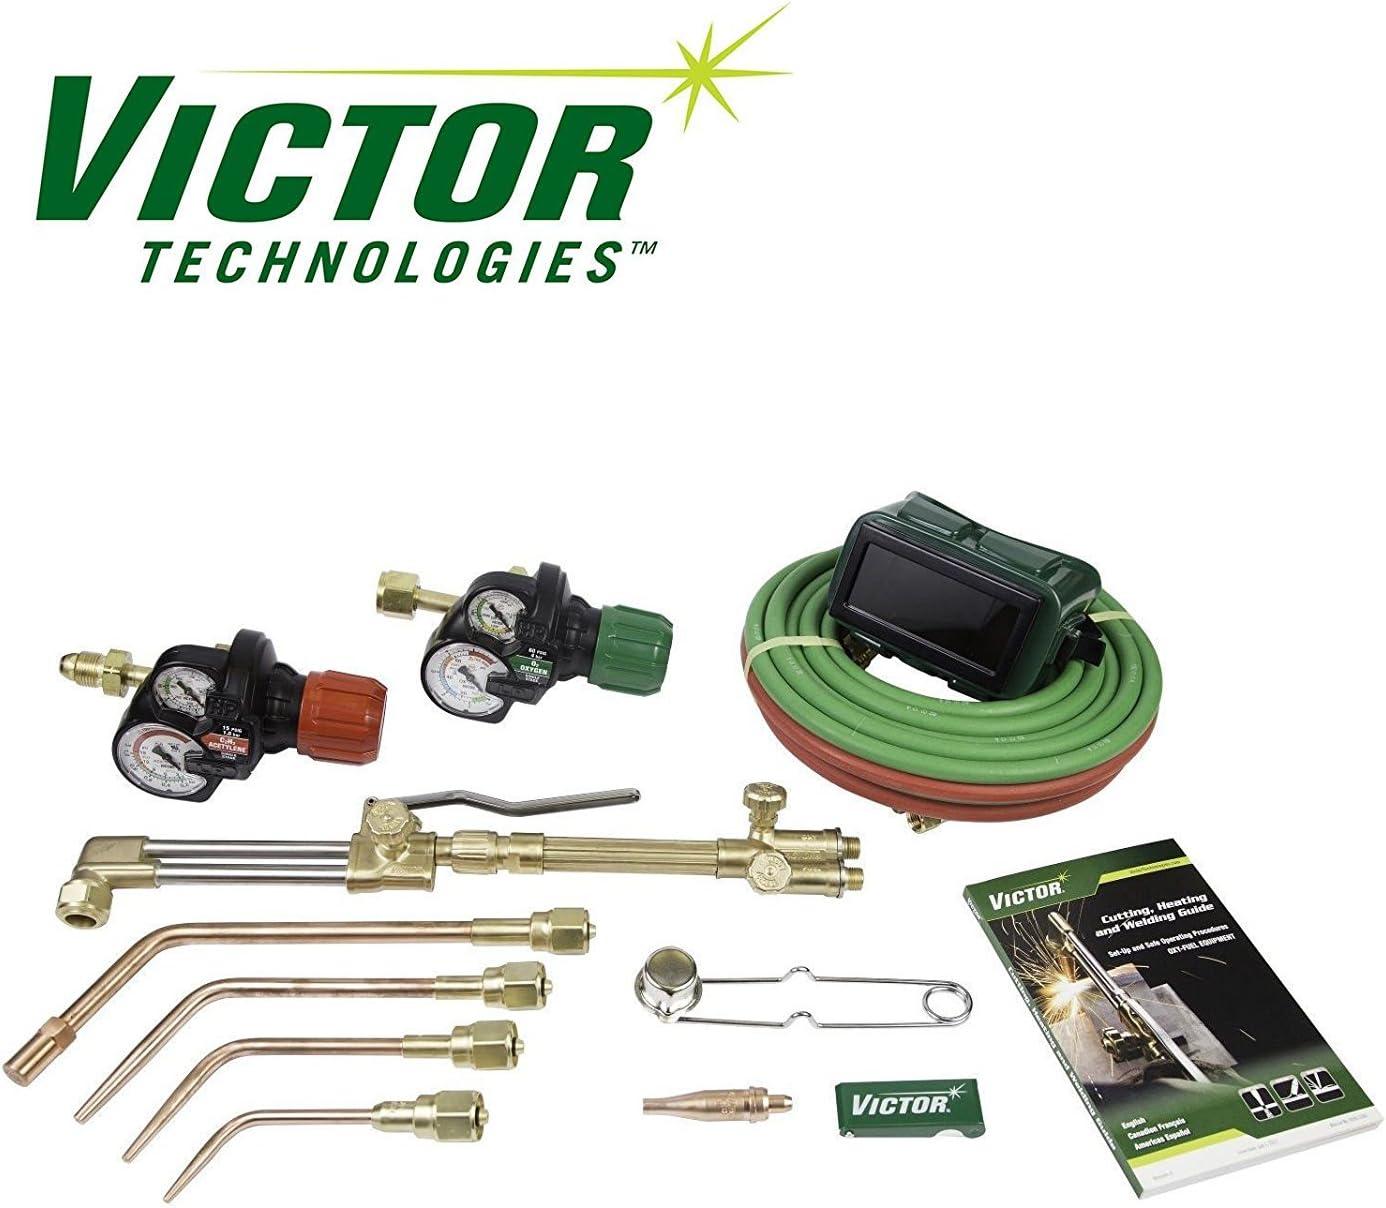 VICTOR 0384-2101 Journeyman Torch Kit Set w/Regulators - Replaces 0384-2036